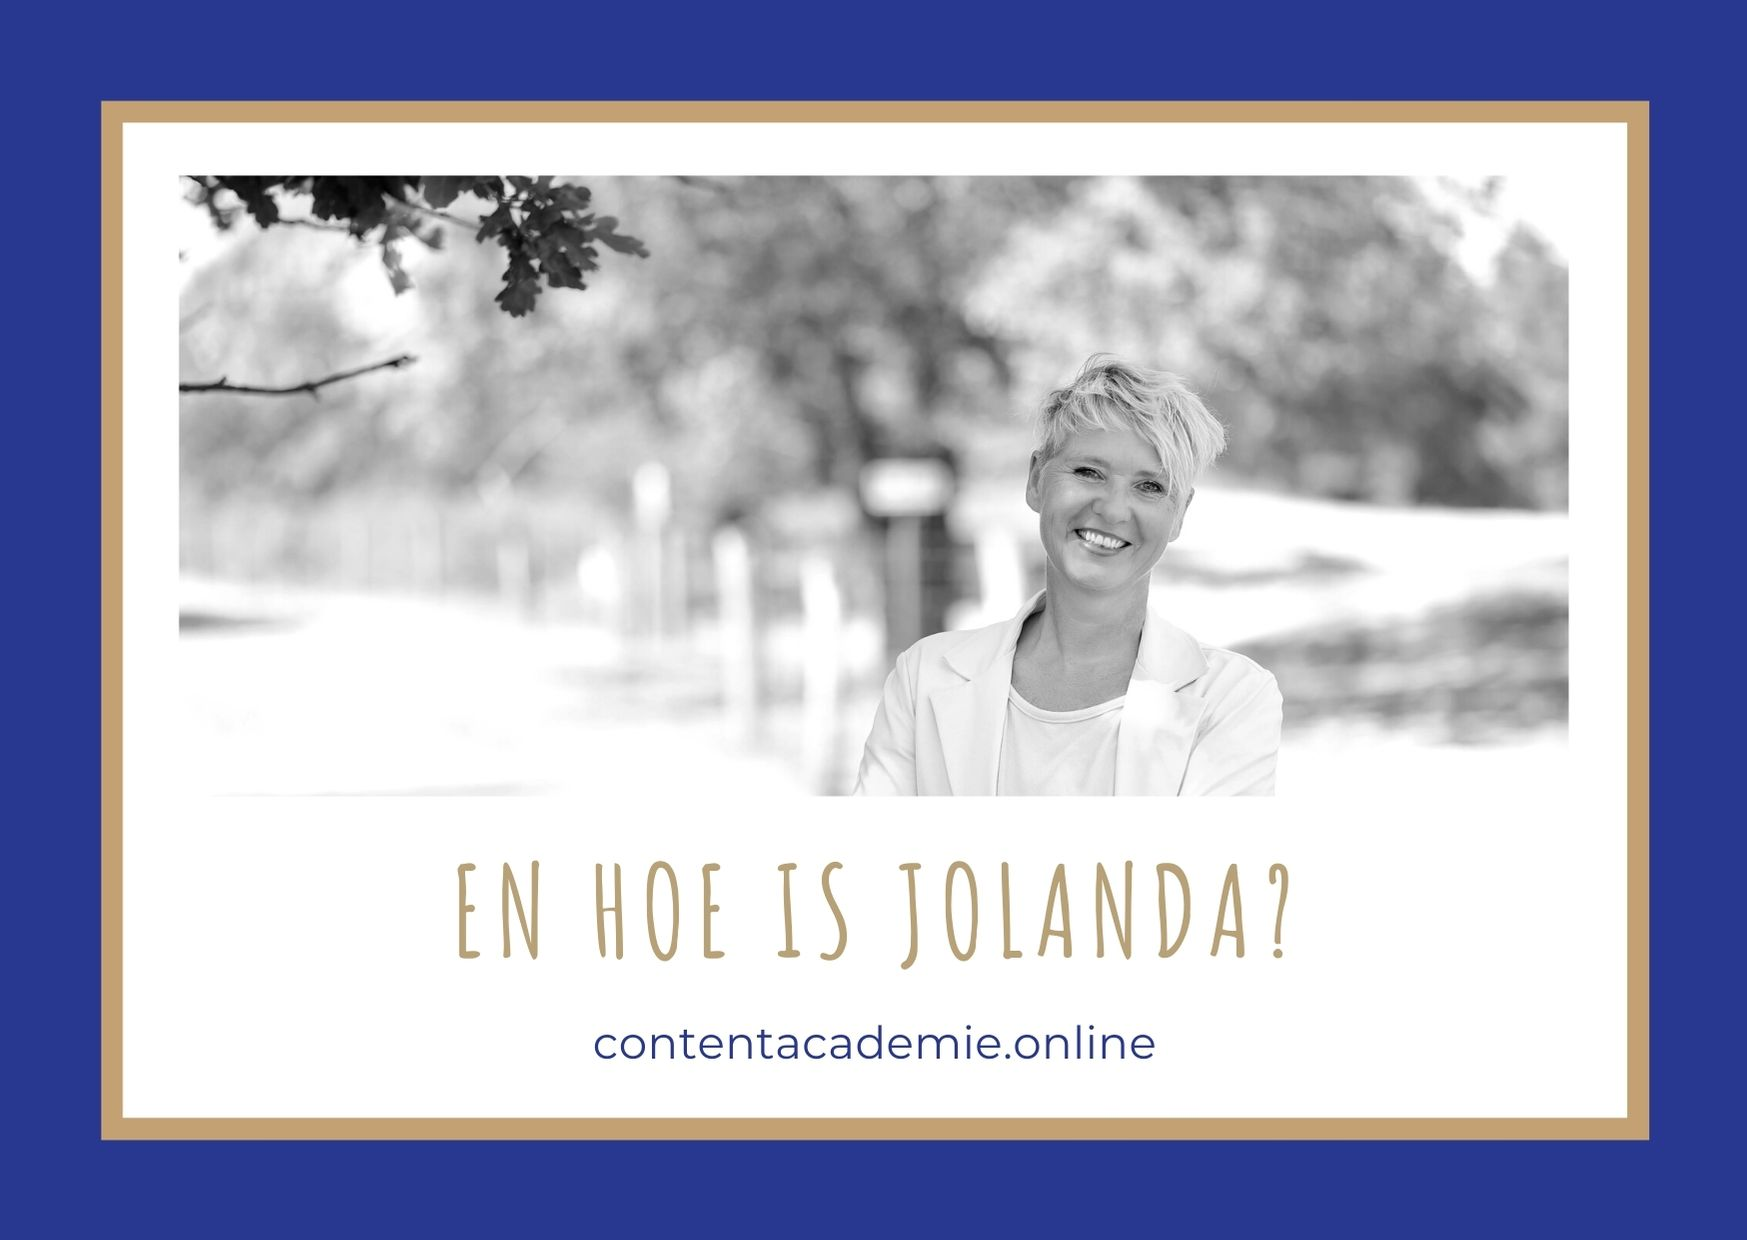 Hoe content is Jolanda Damsma